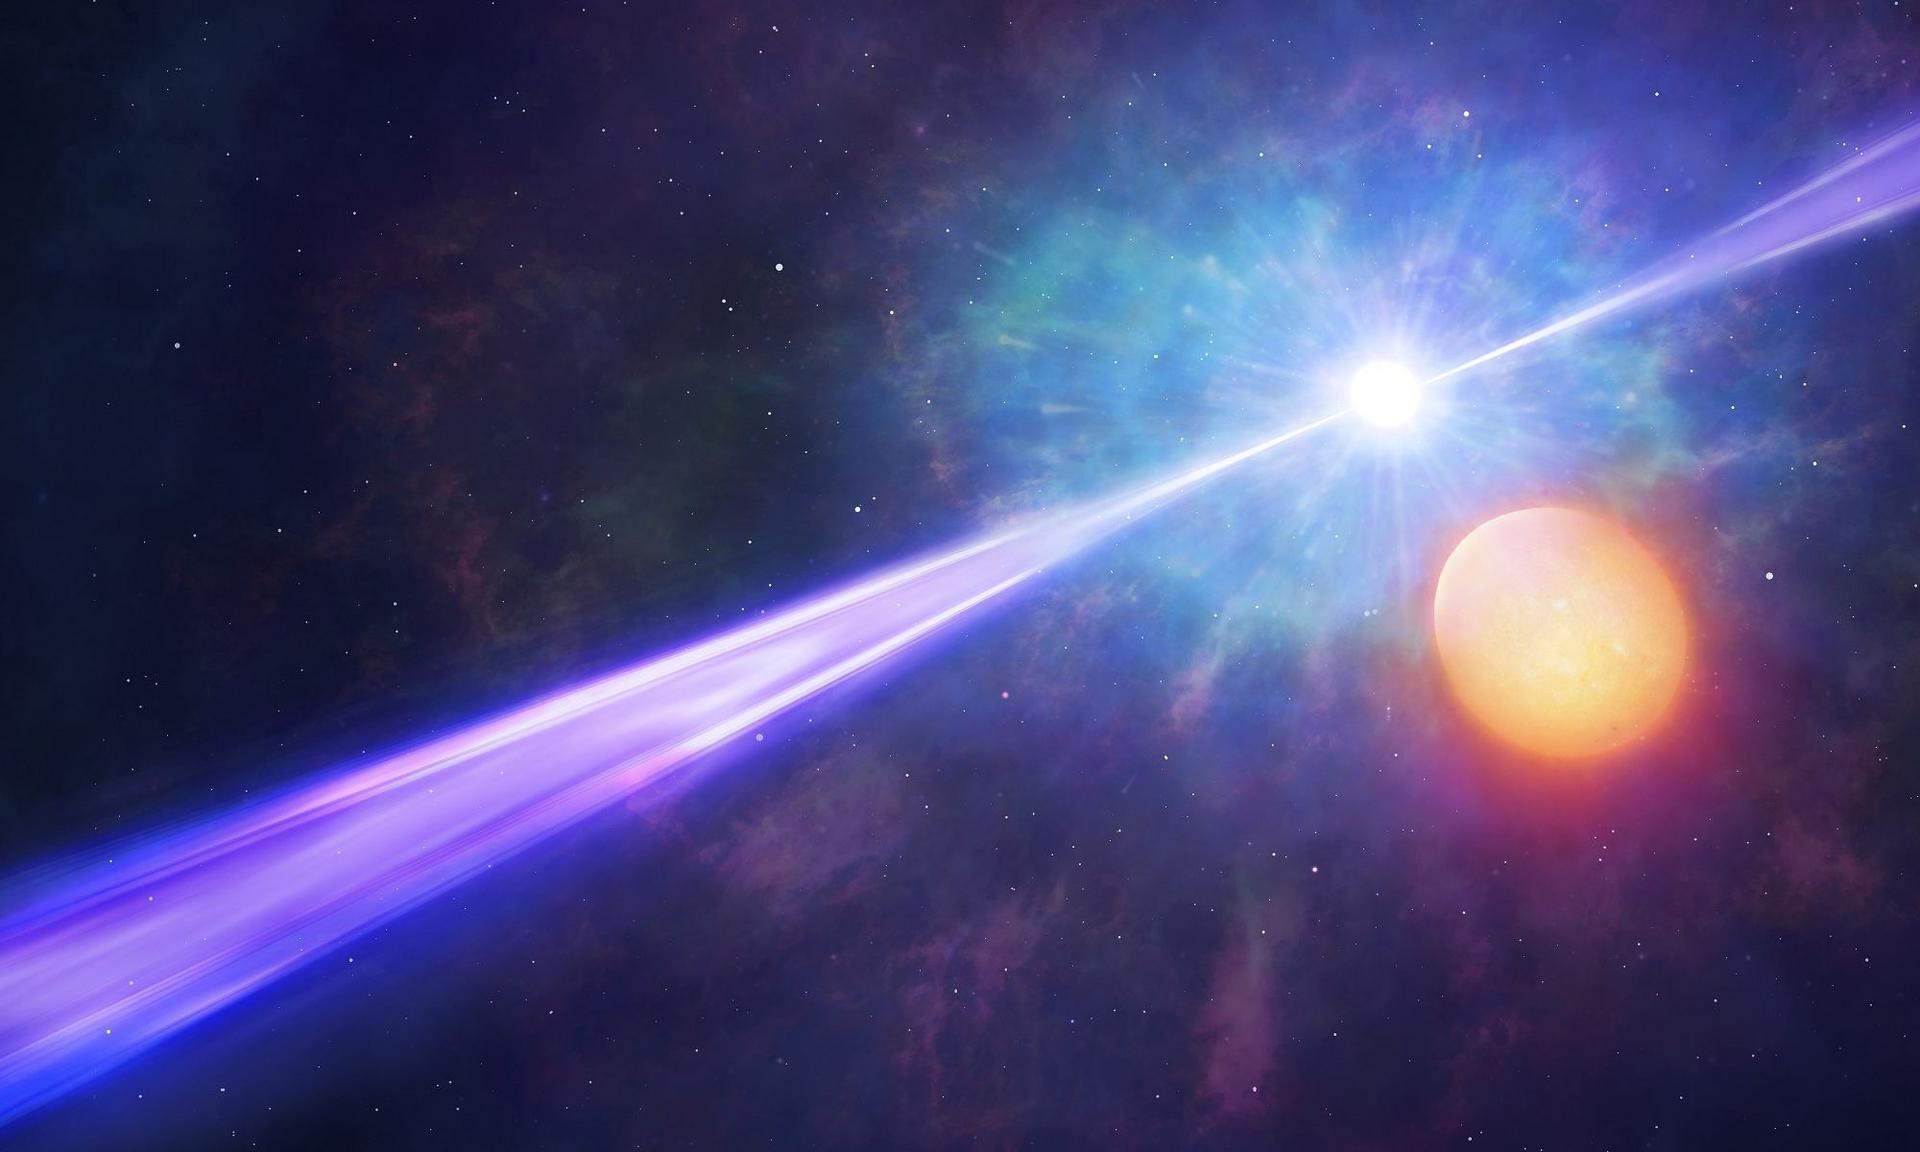 TESS обнаружил гамма-всплеск